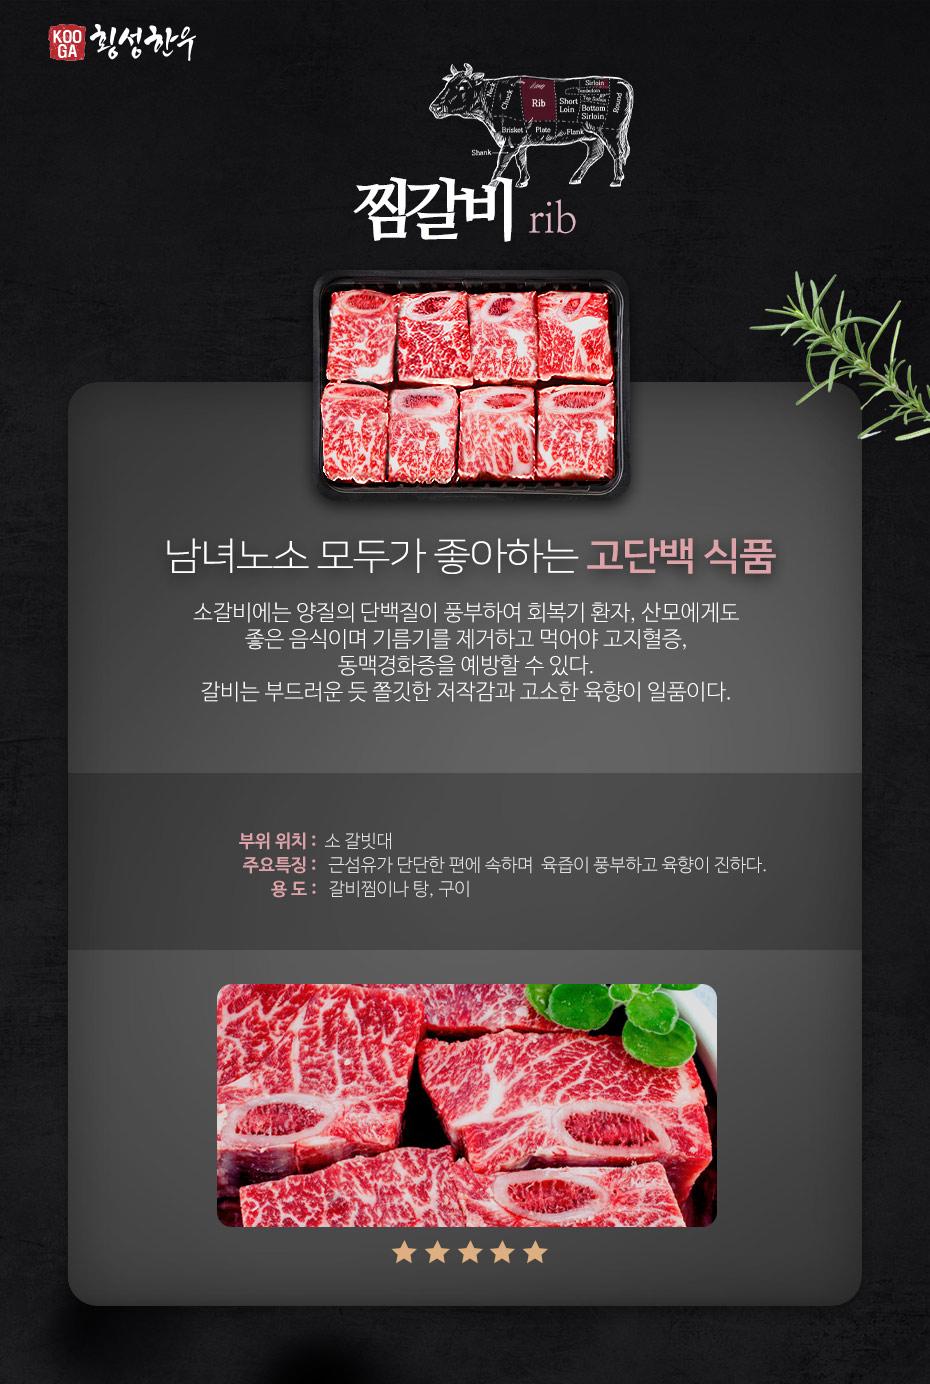 meat_kind_rib_221538.jpg